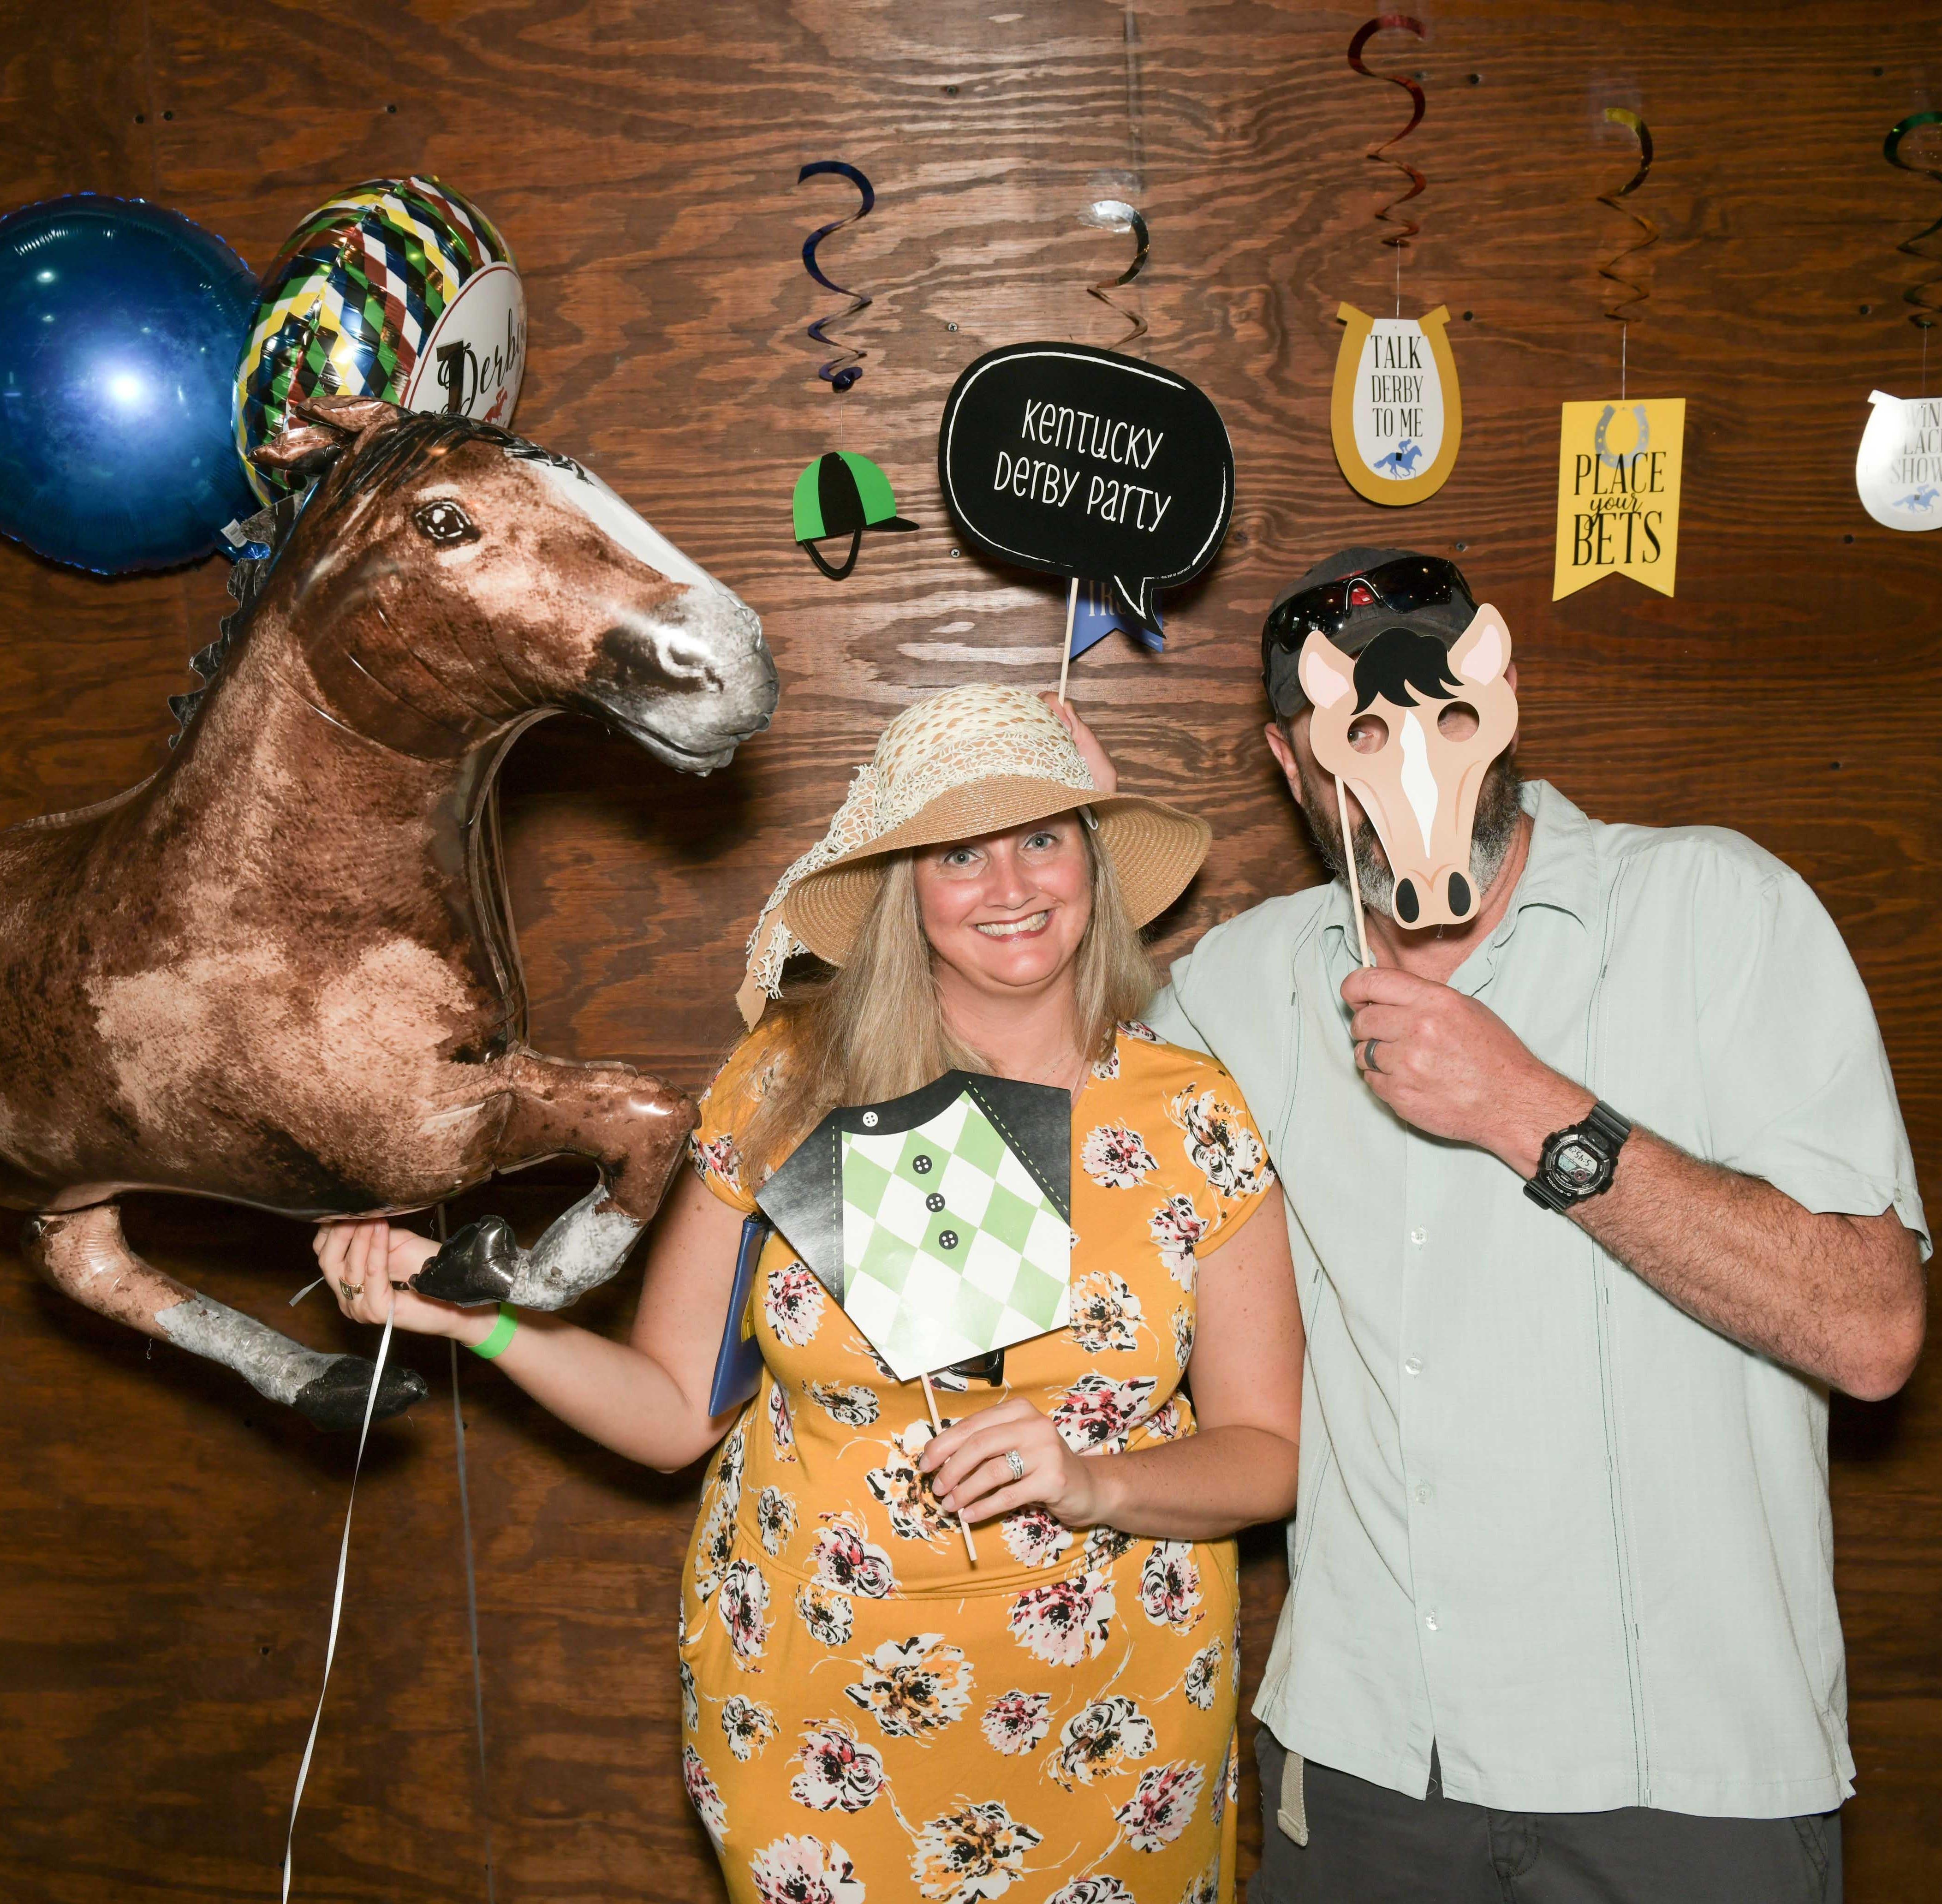 Royal Palms enjoy horsing around at Kentucky Derby-themed fundraiser in Vero Beach